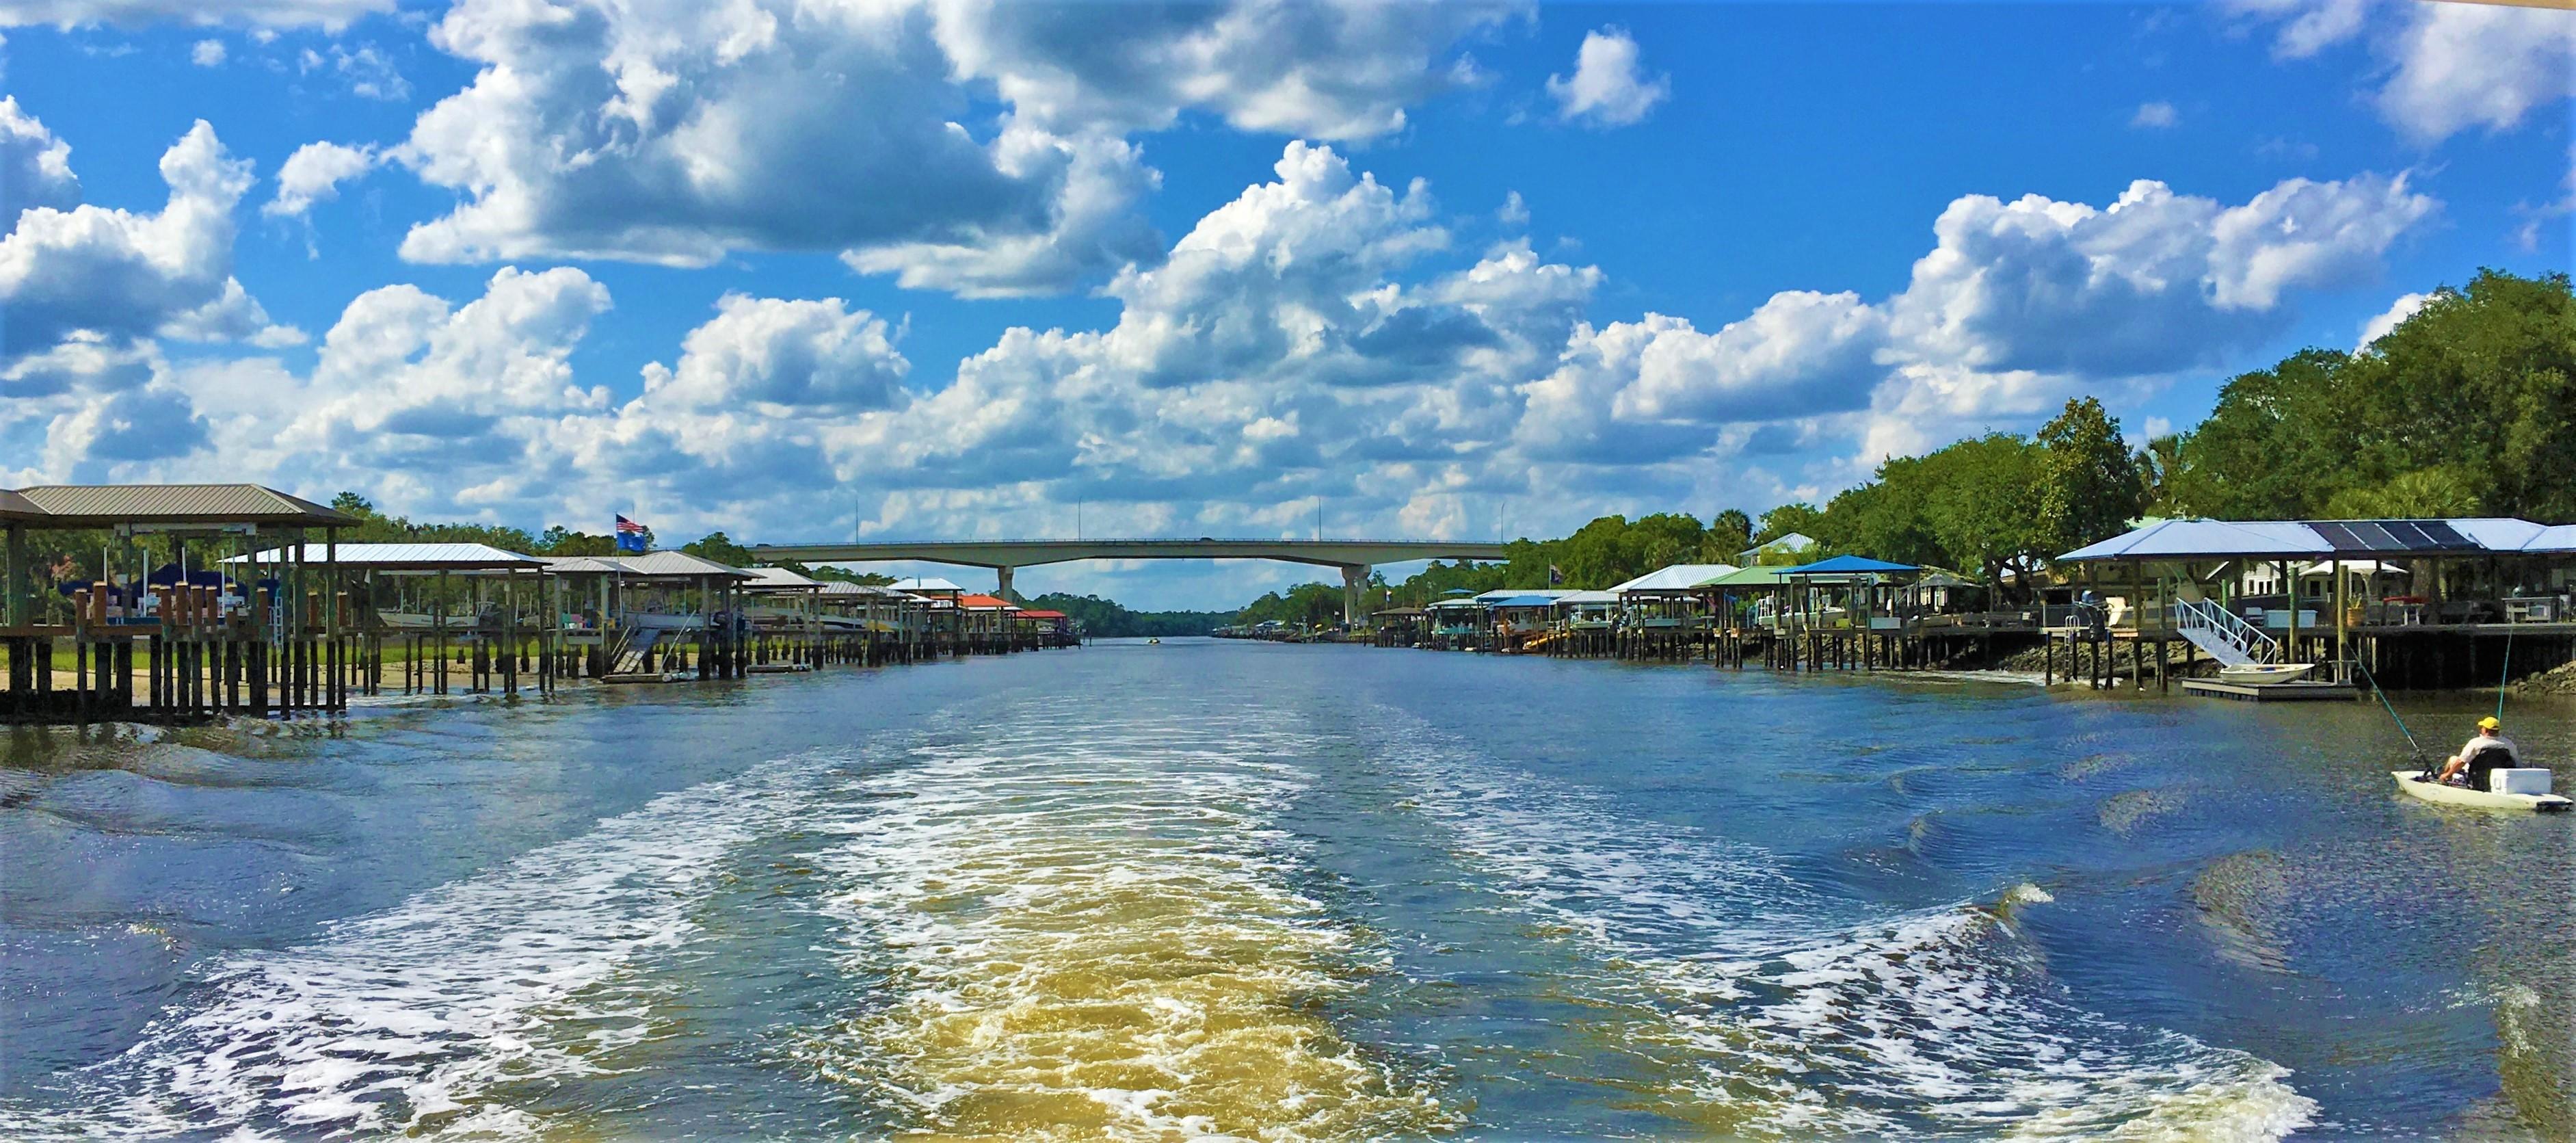 Northeast Florida Intracoastal Waterway Homes | Waterfront